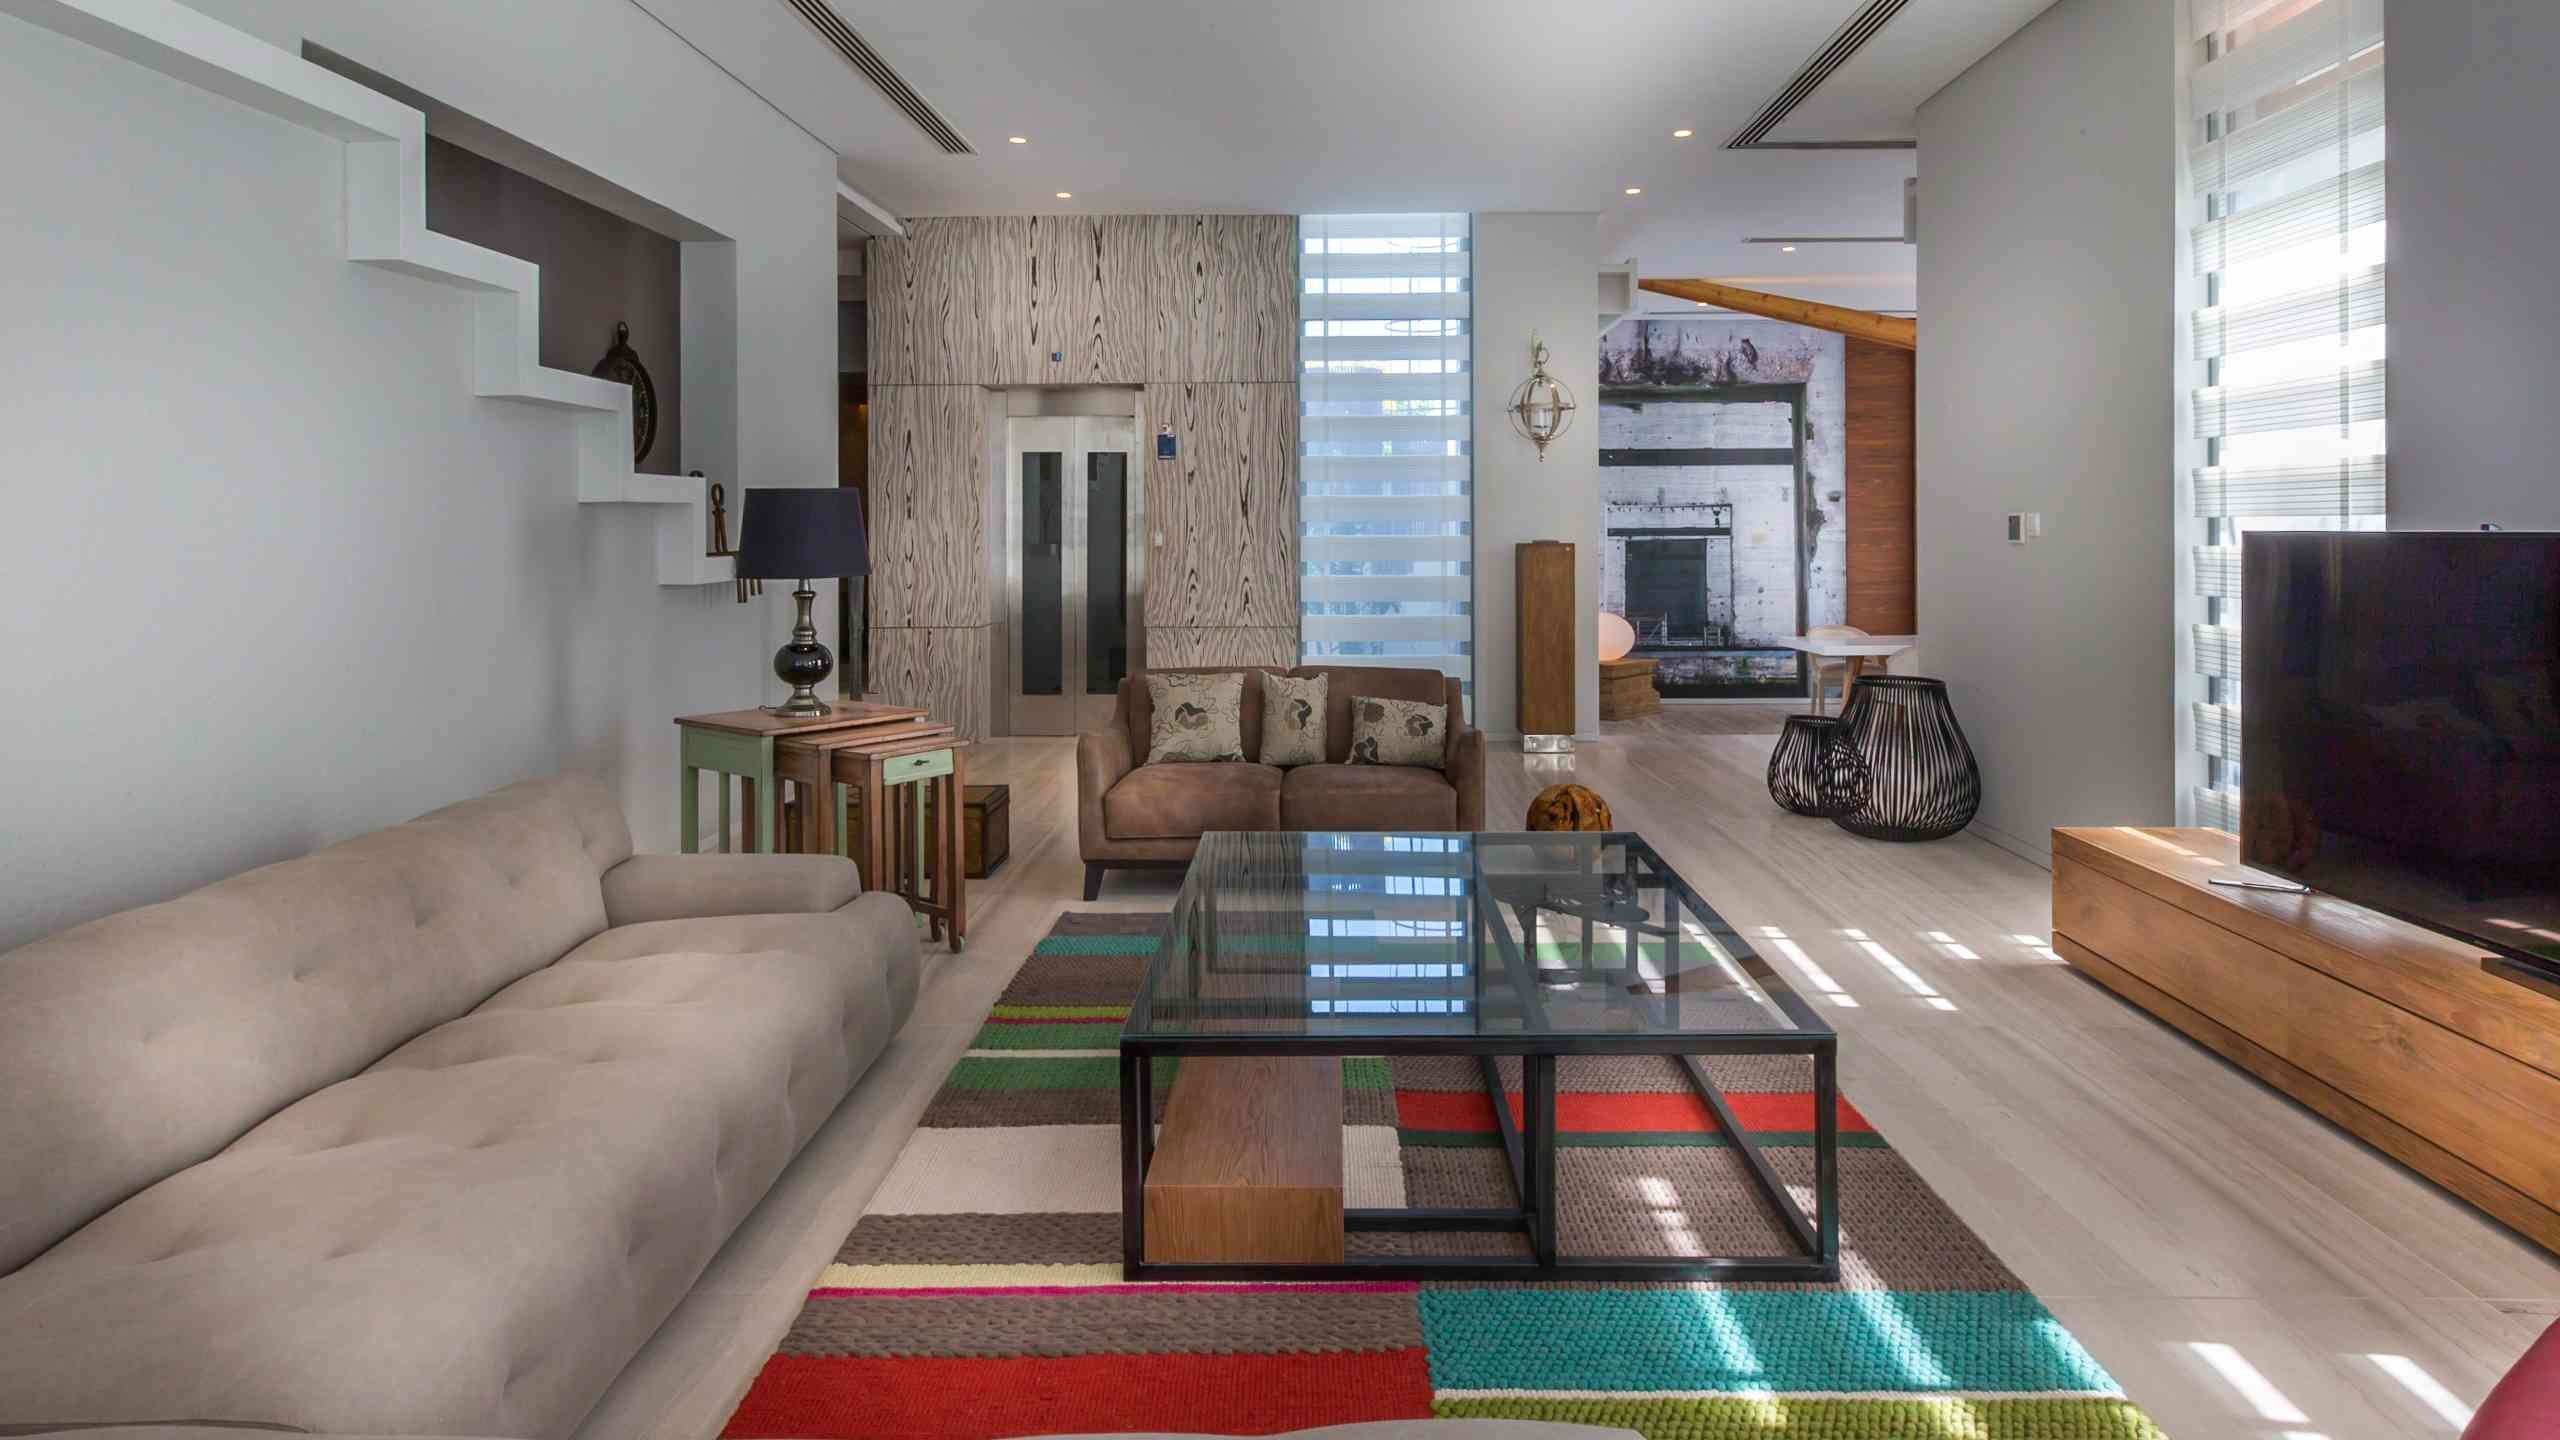 Tv Room Design By Moriq Interiors Tv Room Design Interior